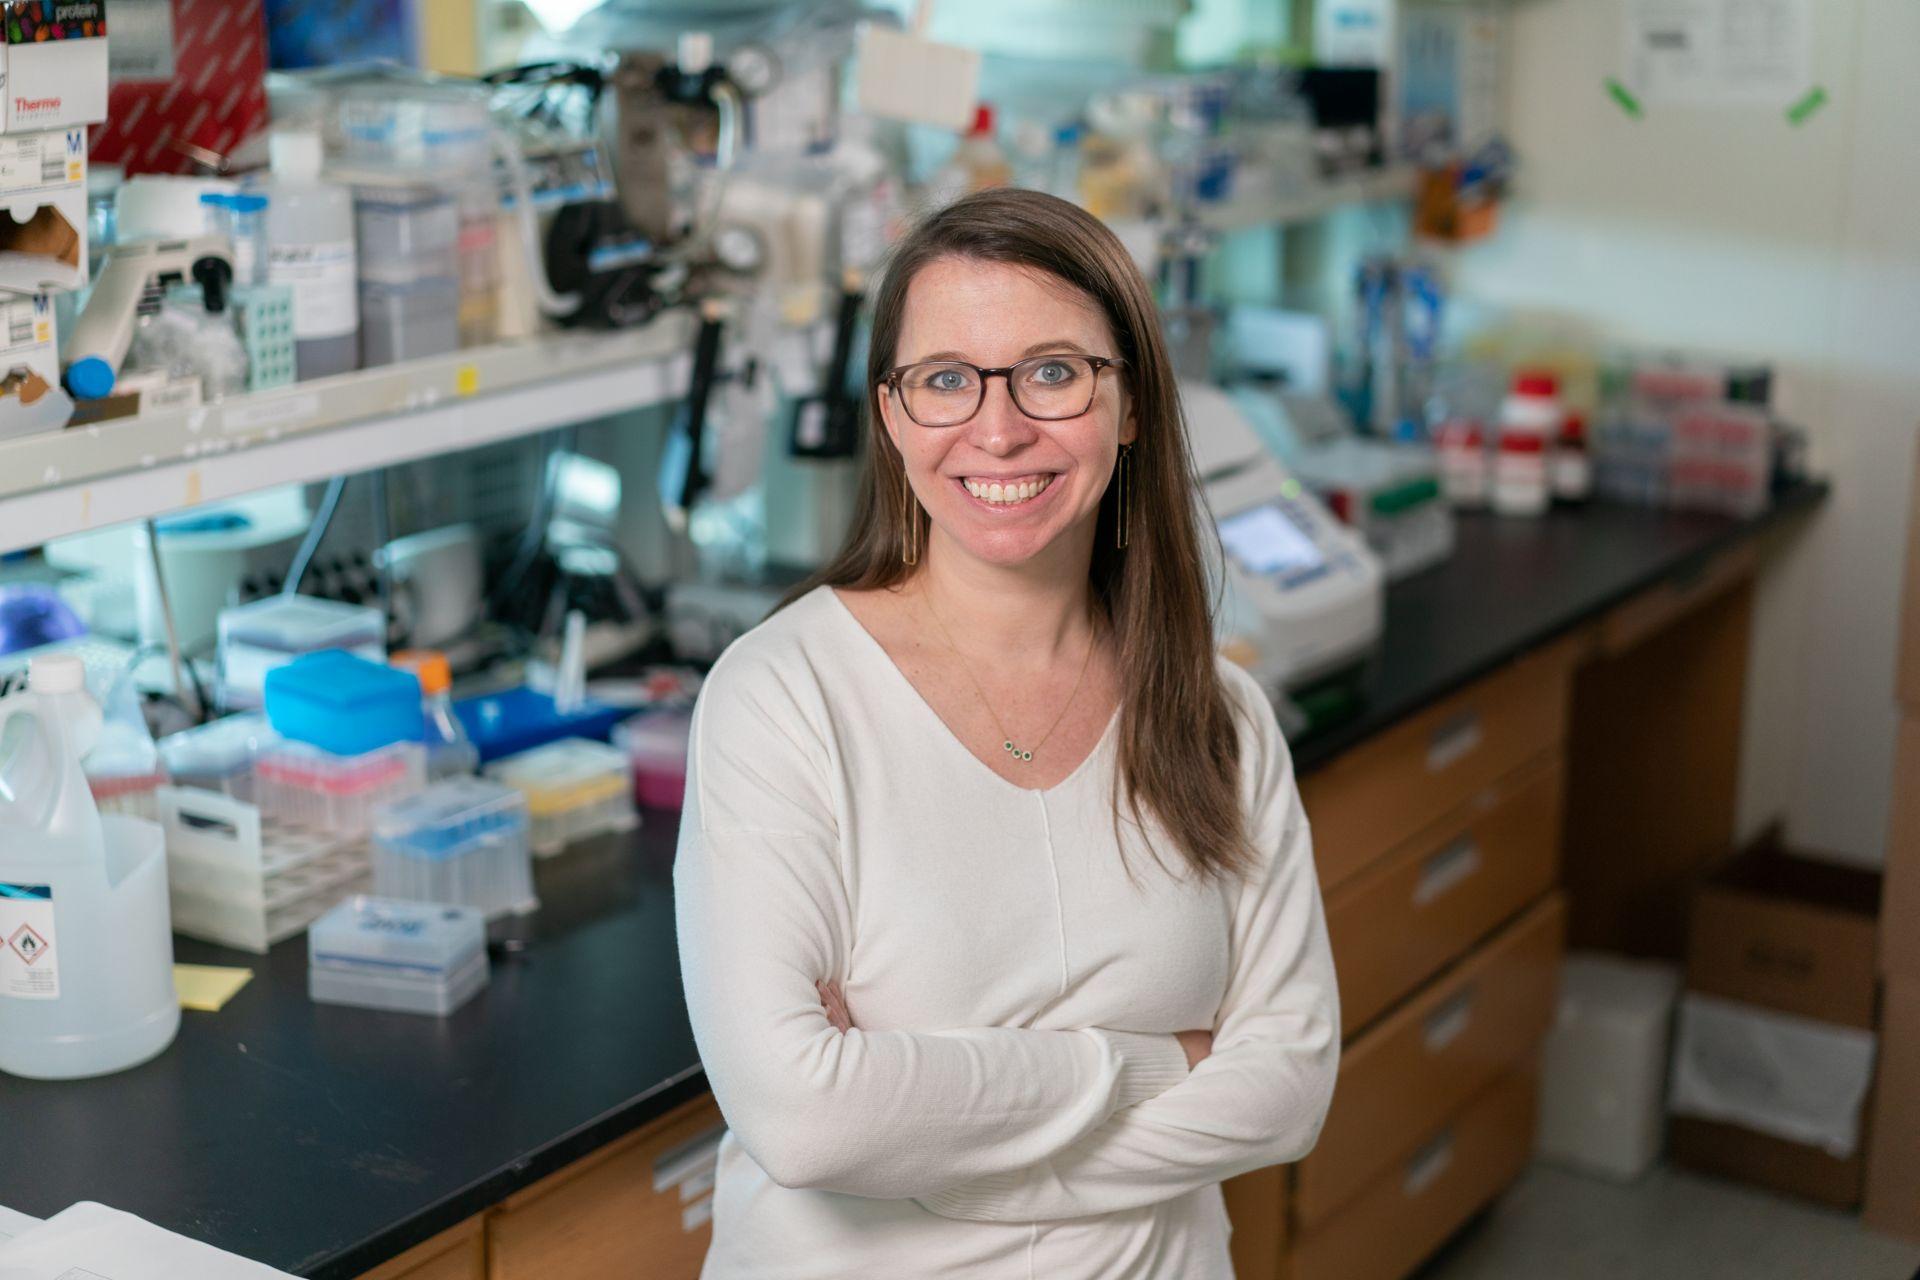 Emma (Kaity) Sliger, PhD